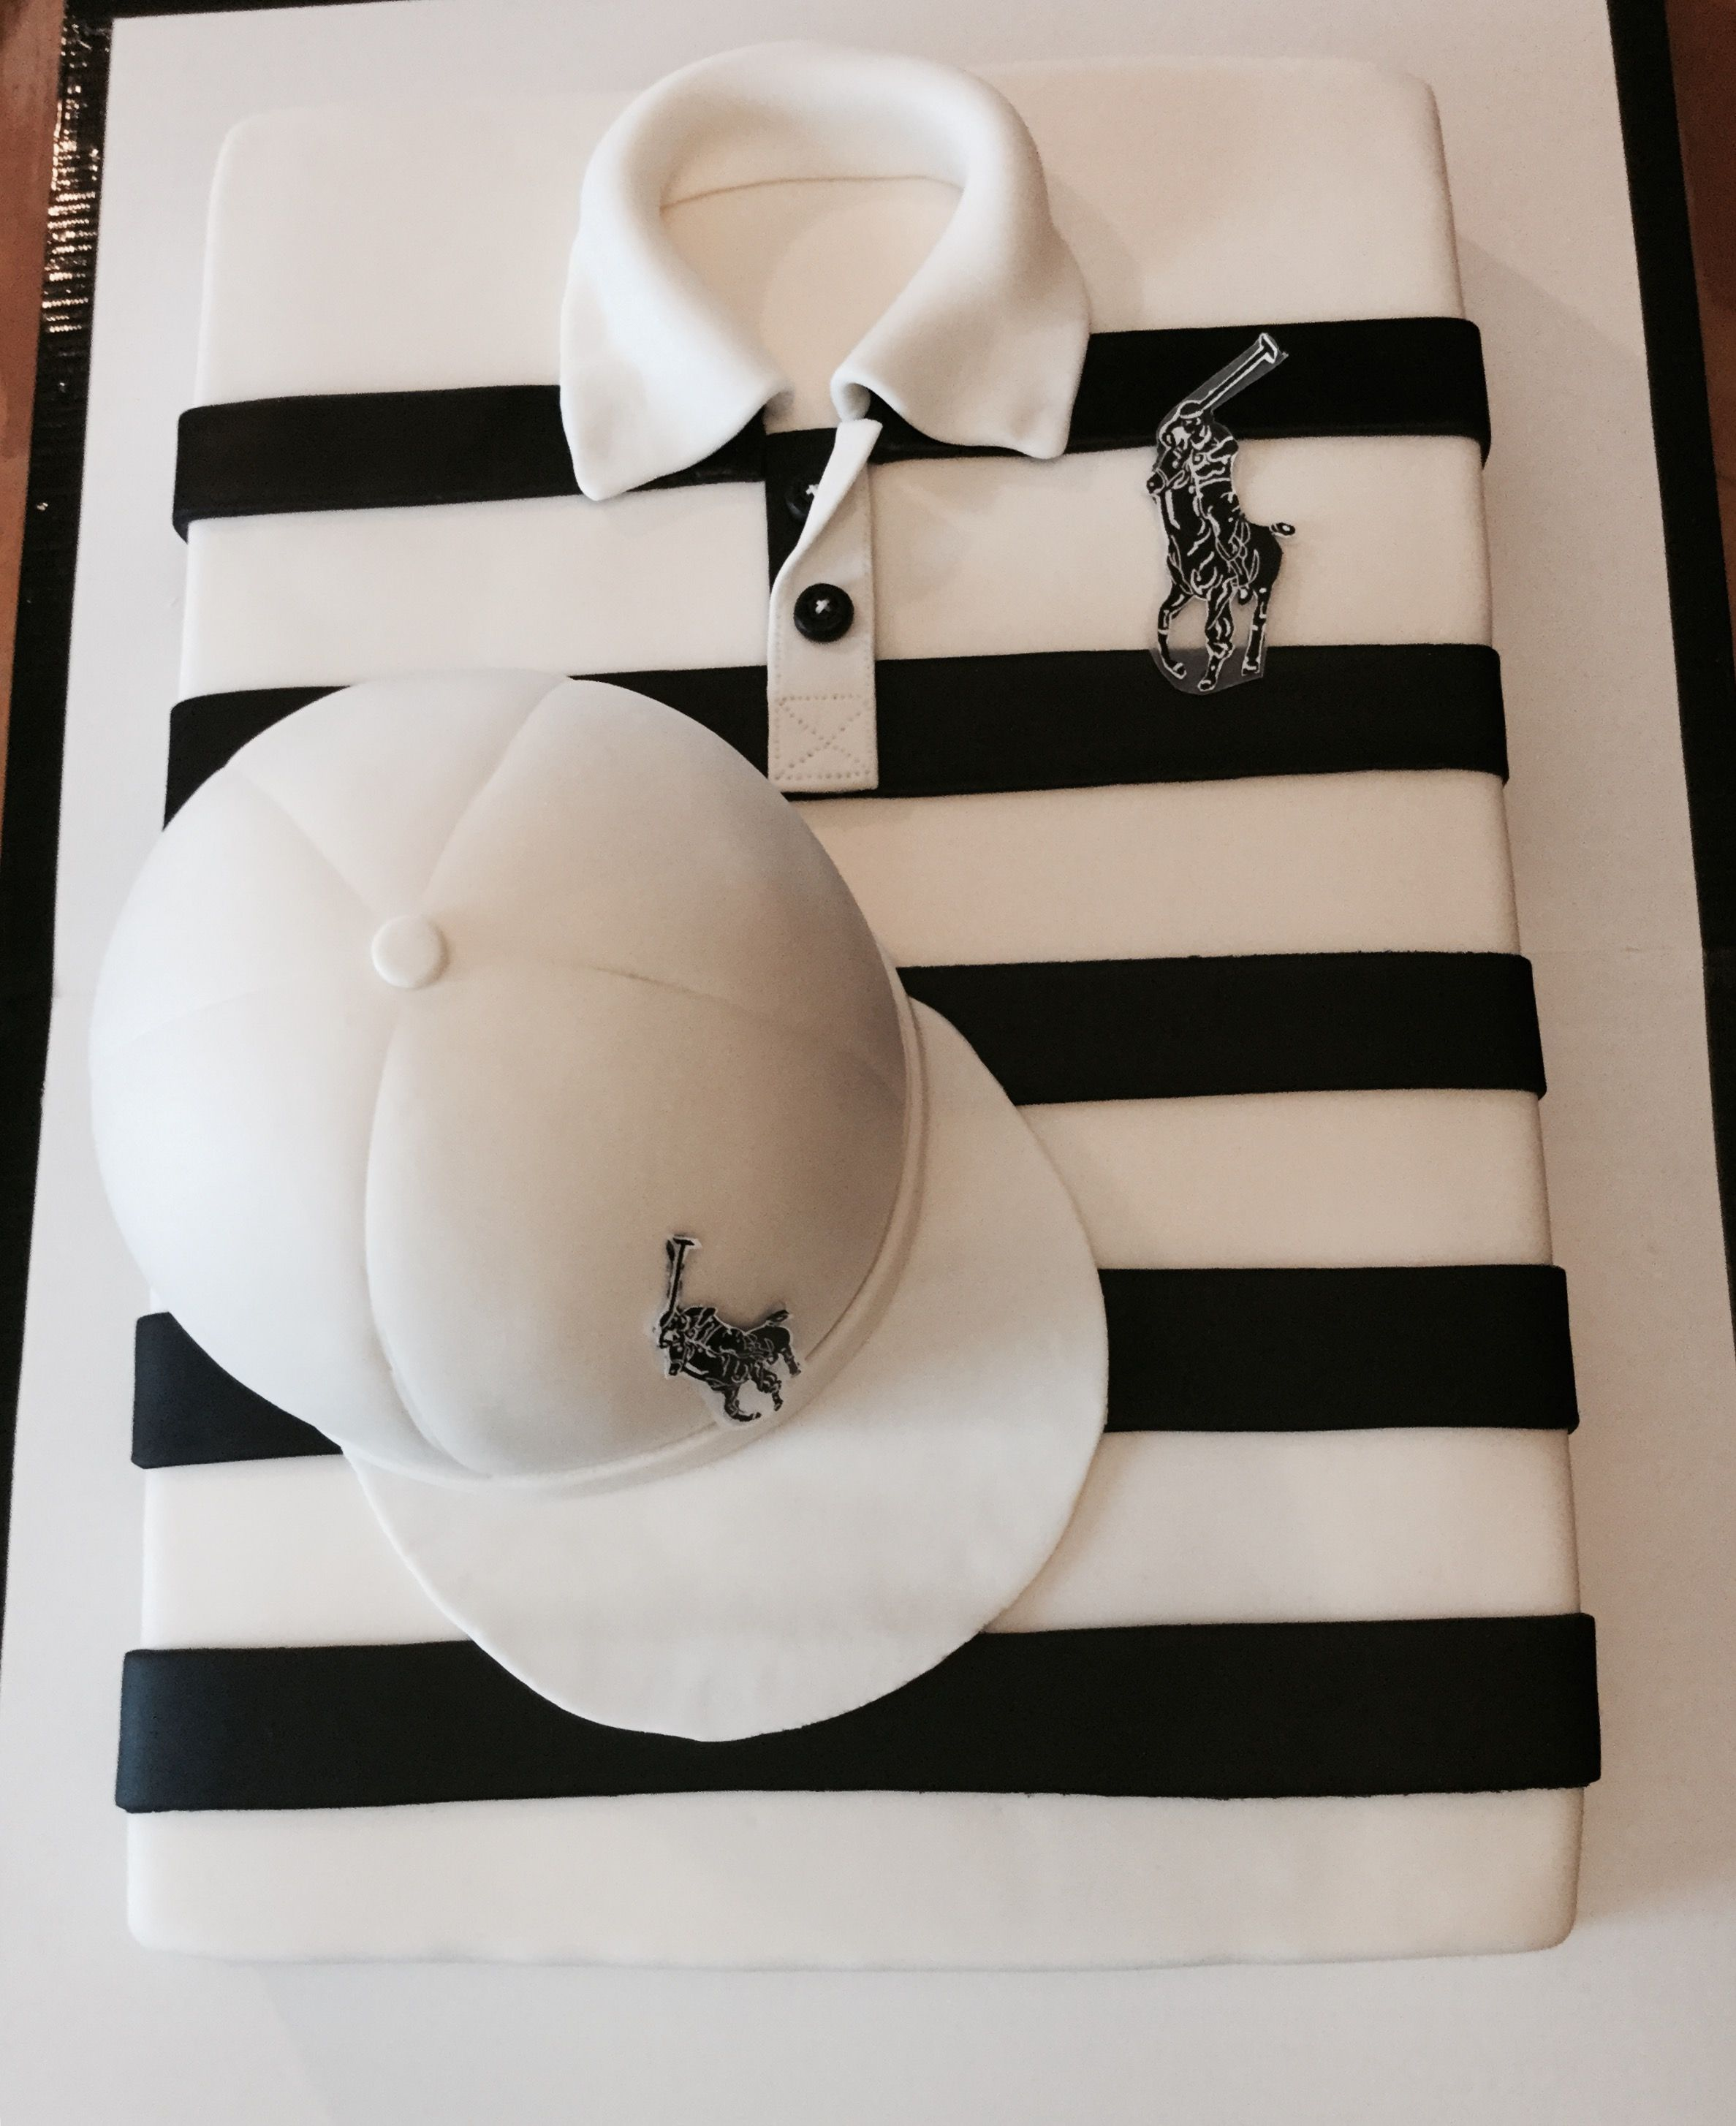 Ralph Lauren Polo shirt birthday cake Custom Cakes by Cake